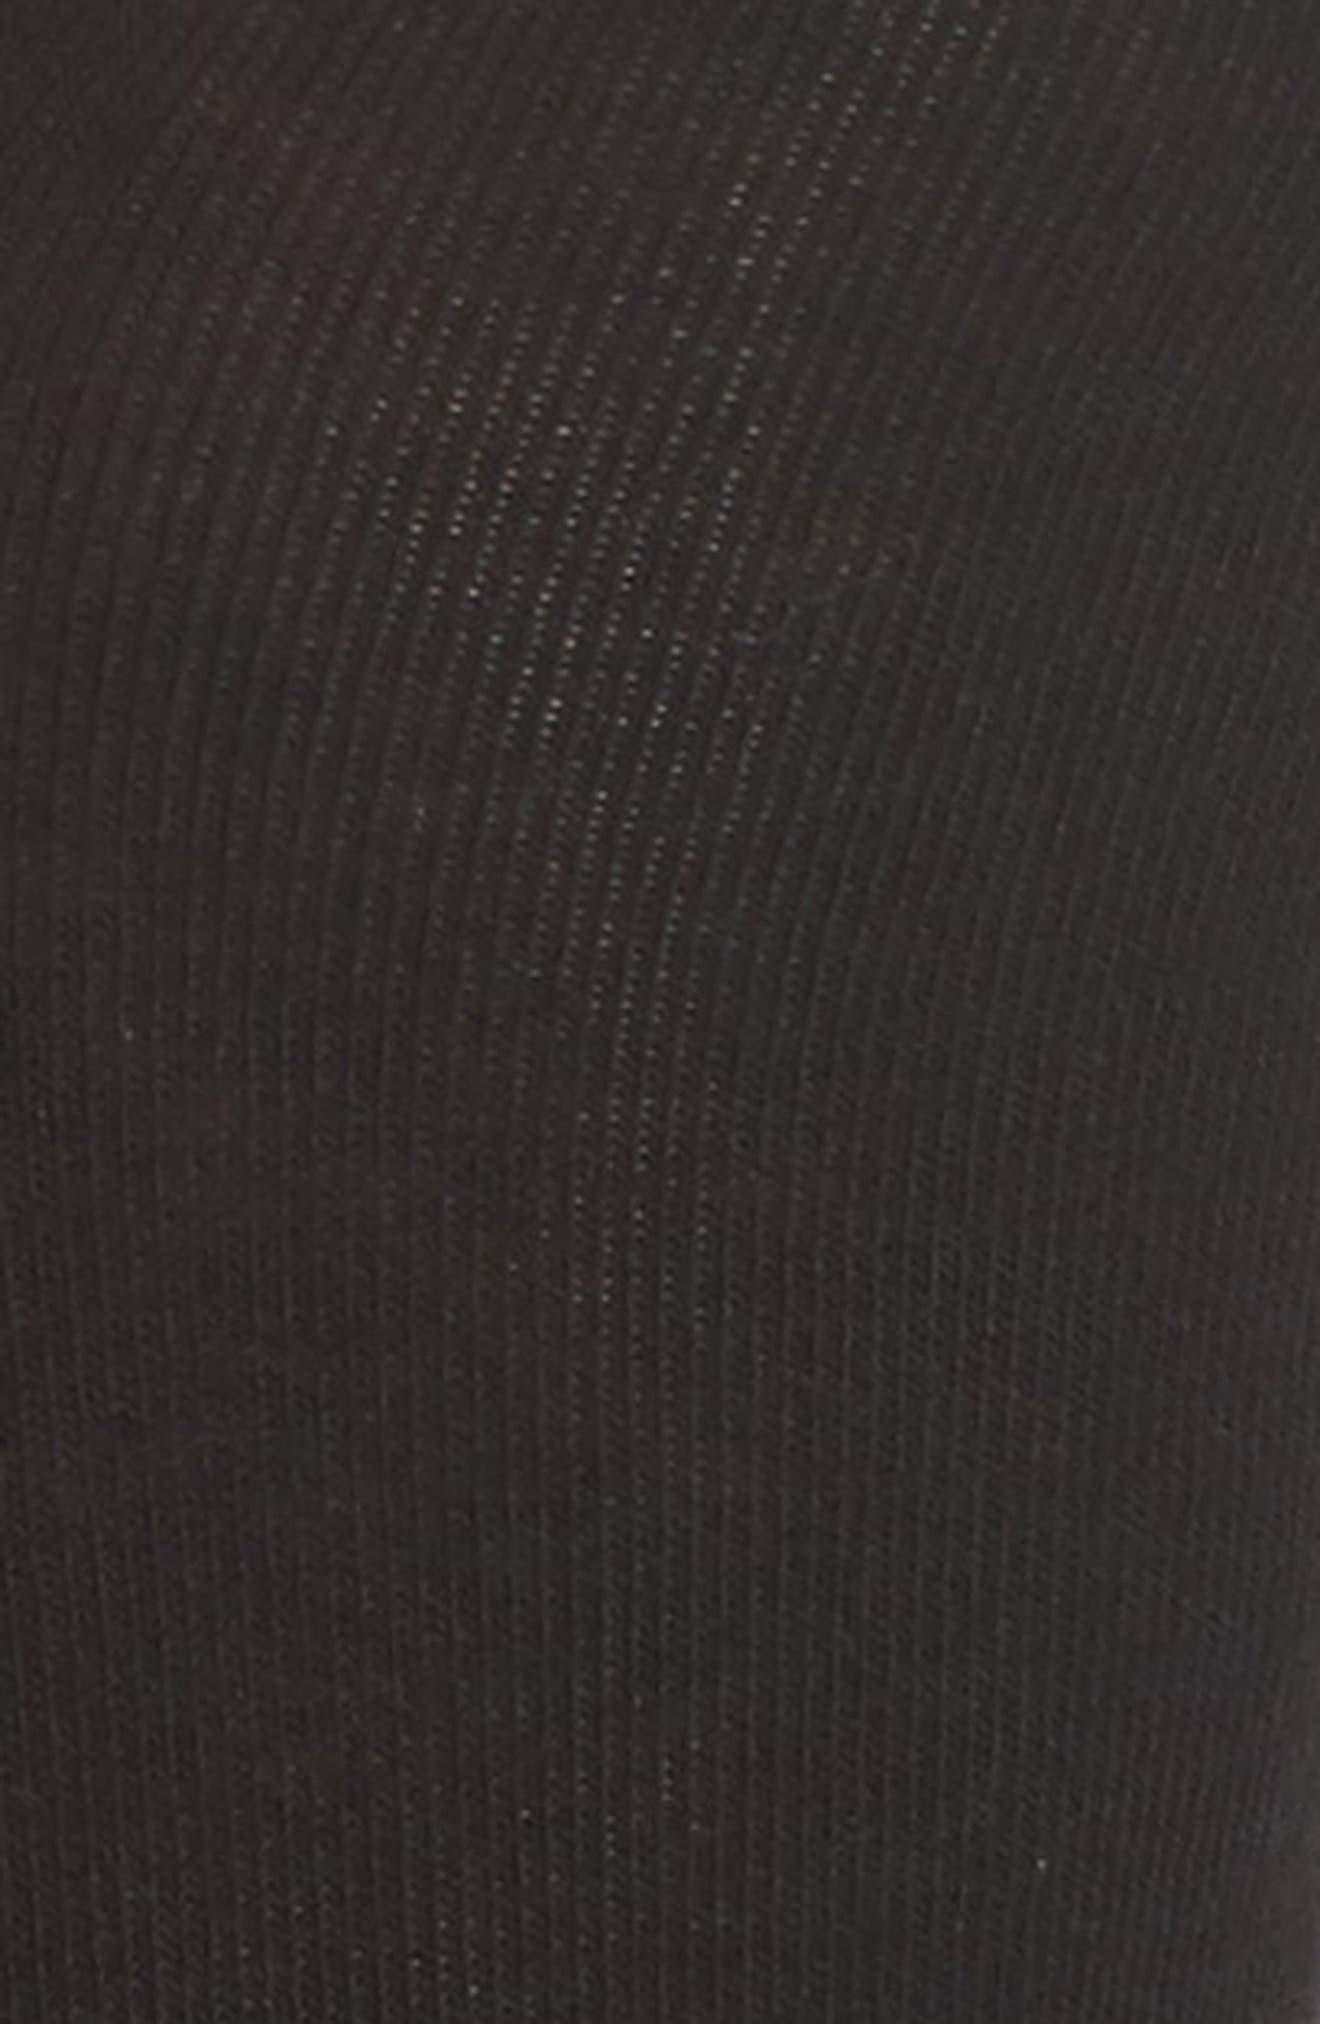 Alternate Image 2  - Hue Embroidered Heart Ankle Socks